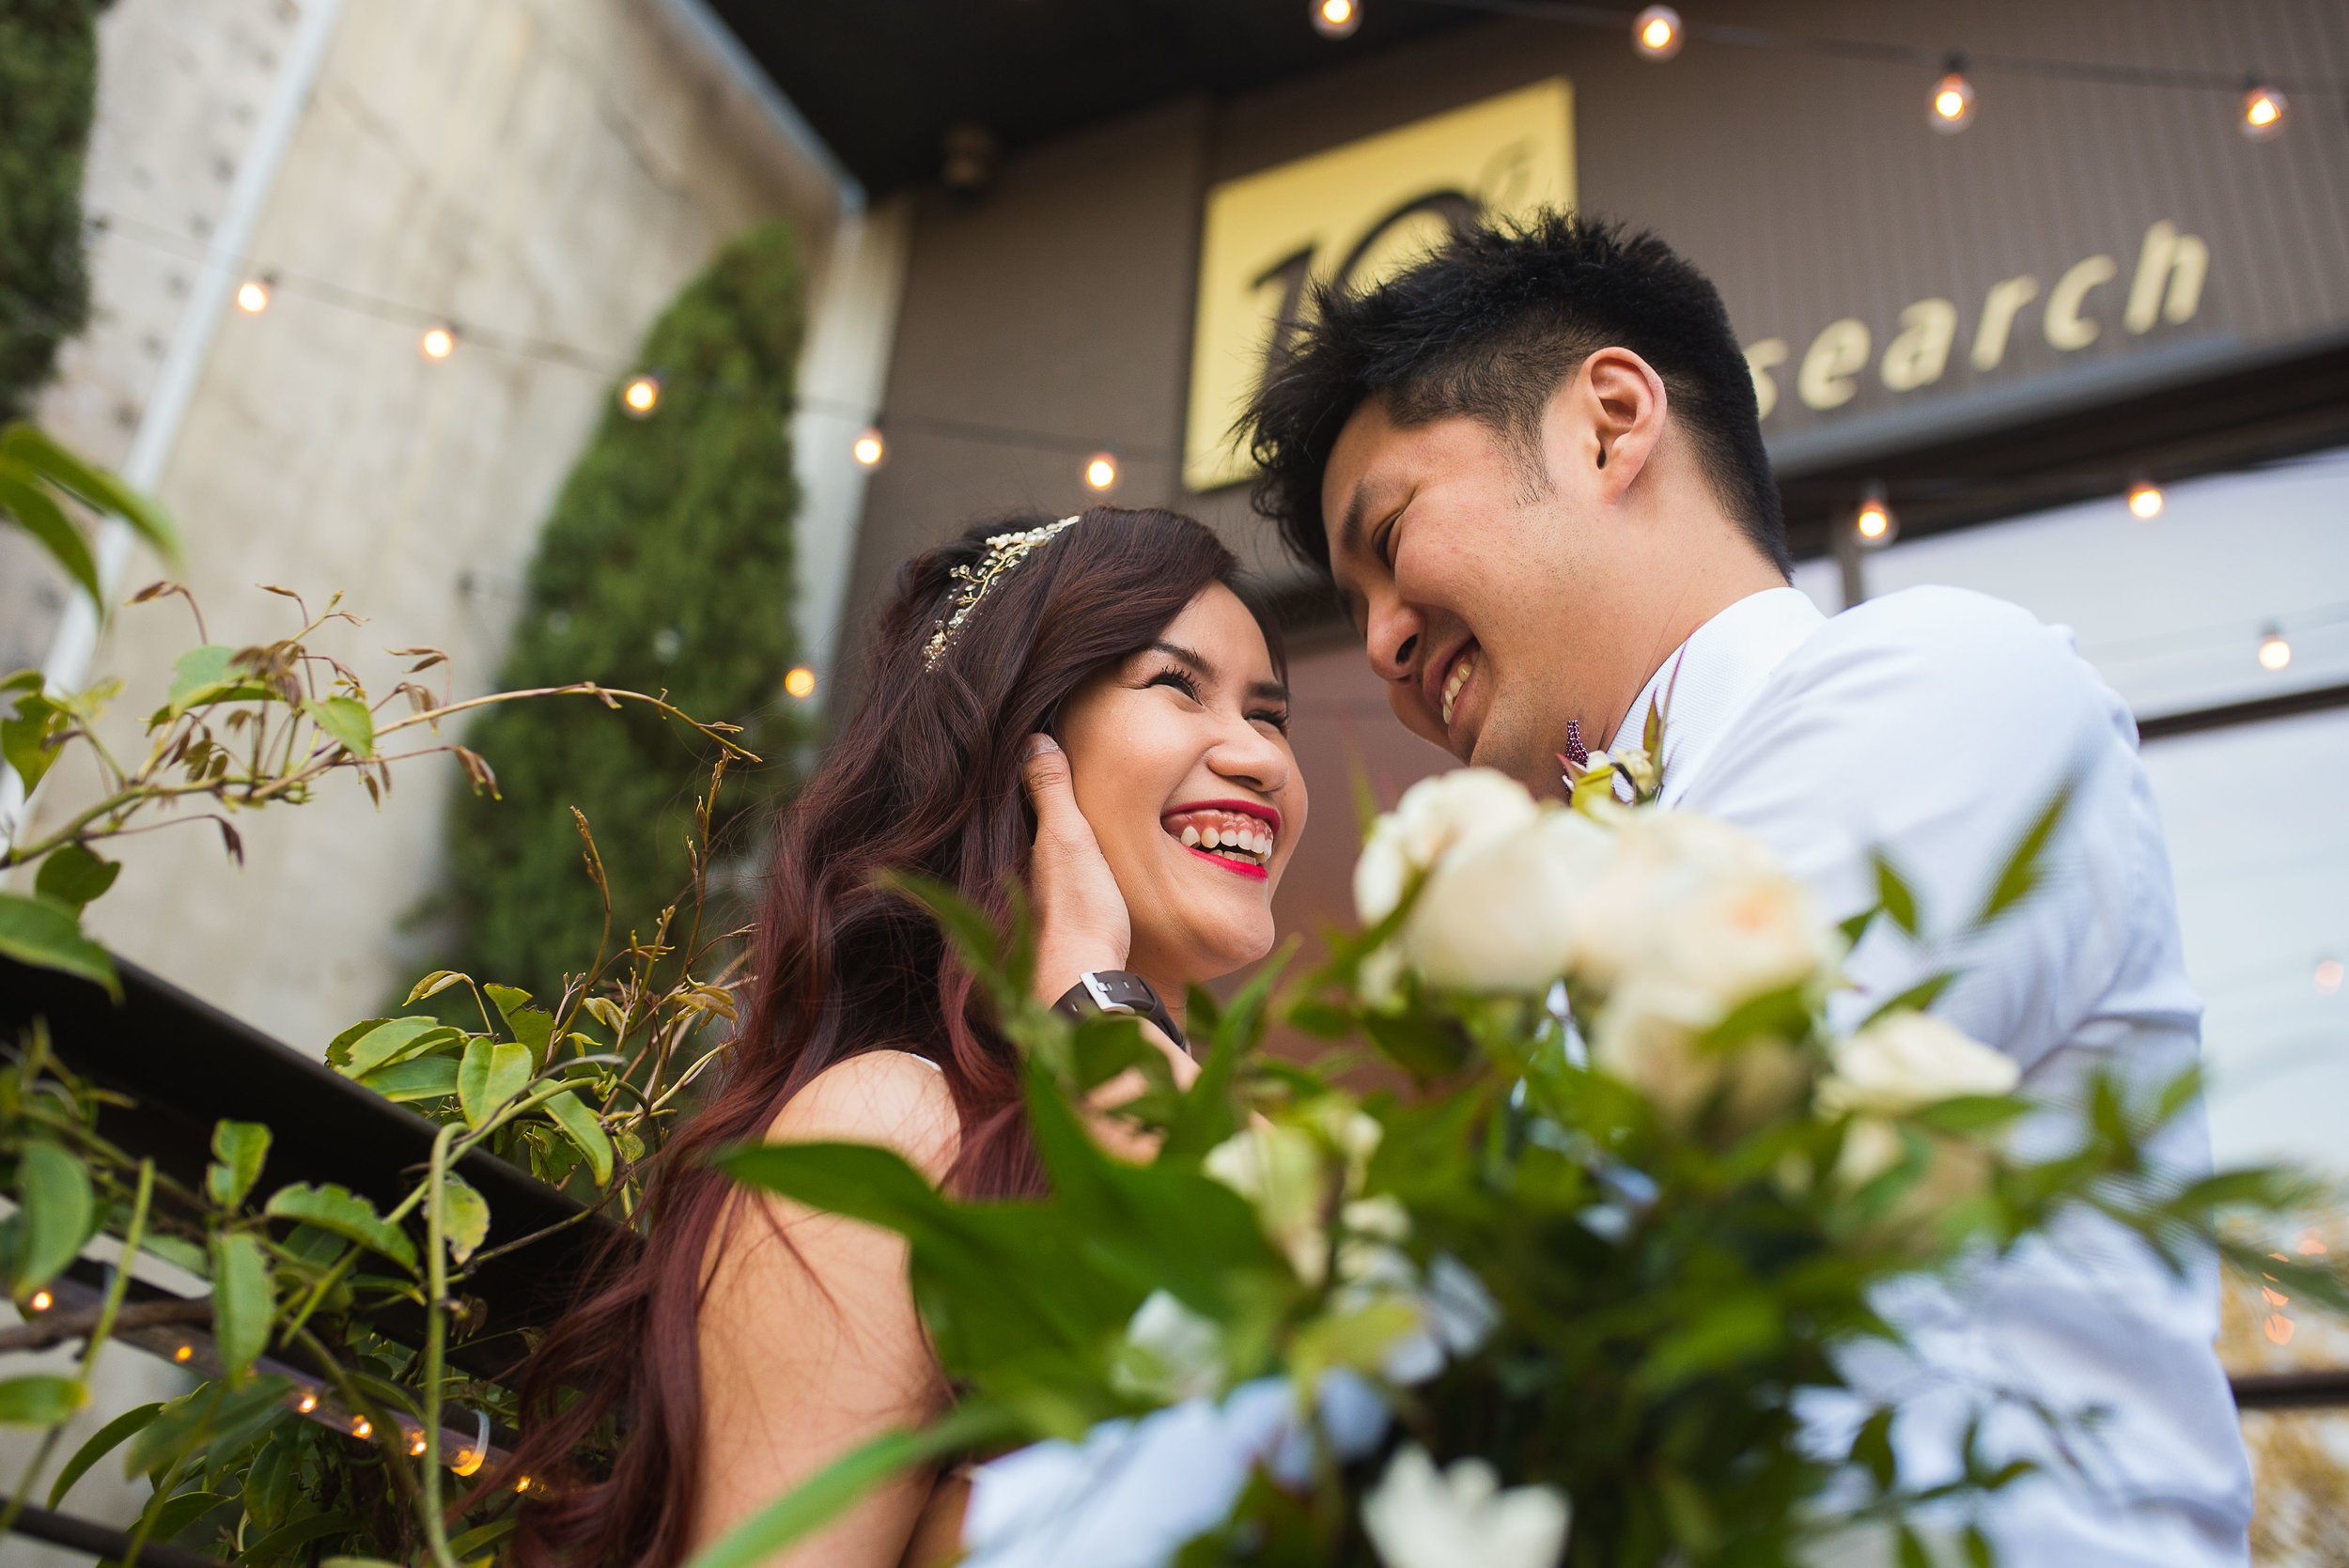 seattle-wedding-spring-10-degrees-capitol-hill-washington-1-21.jpg